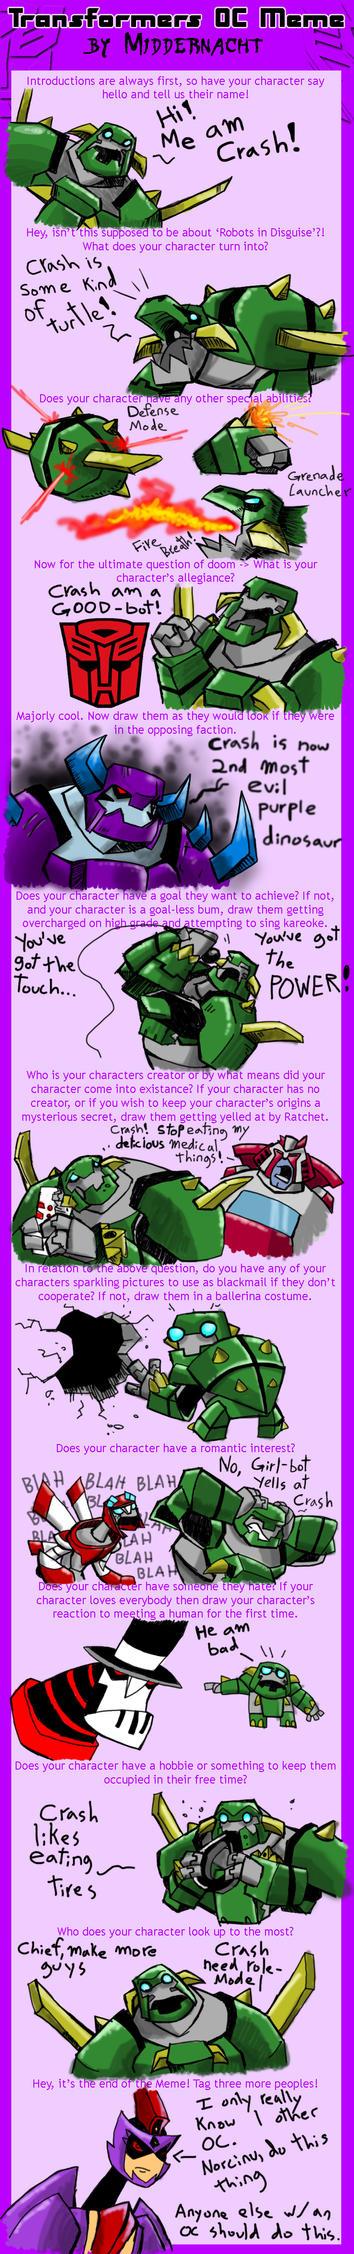 Transformers OC meme: Crash by chief-orc